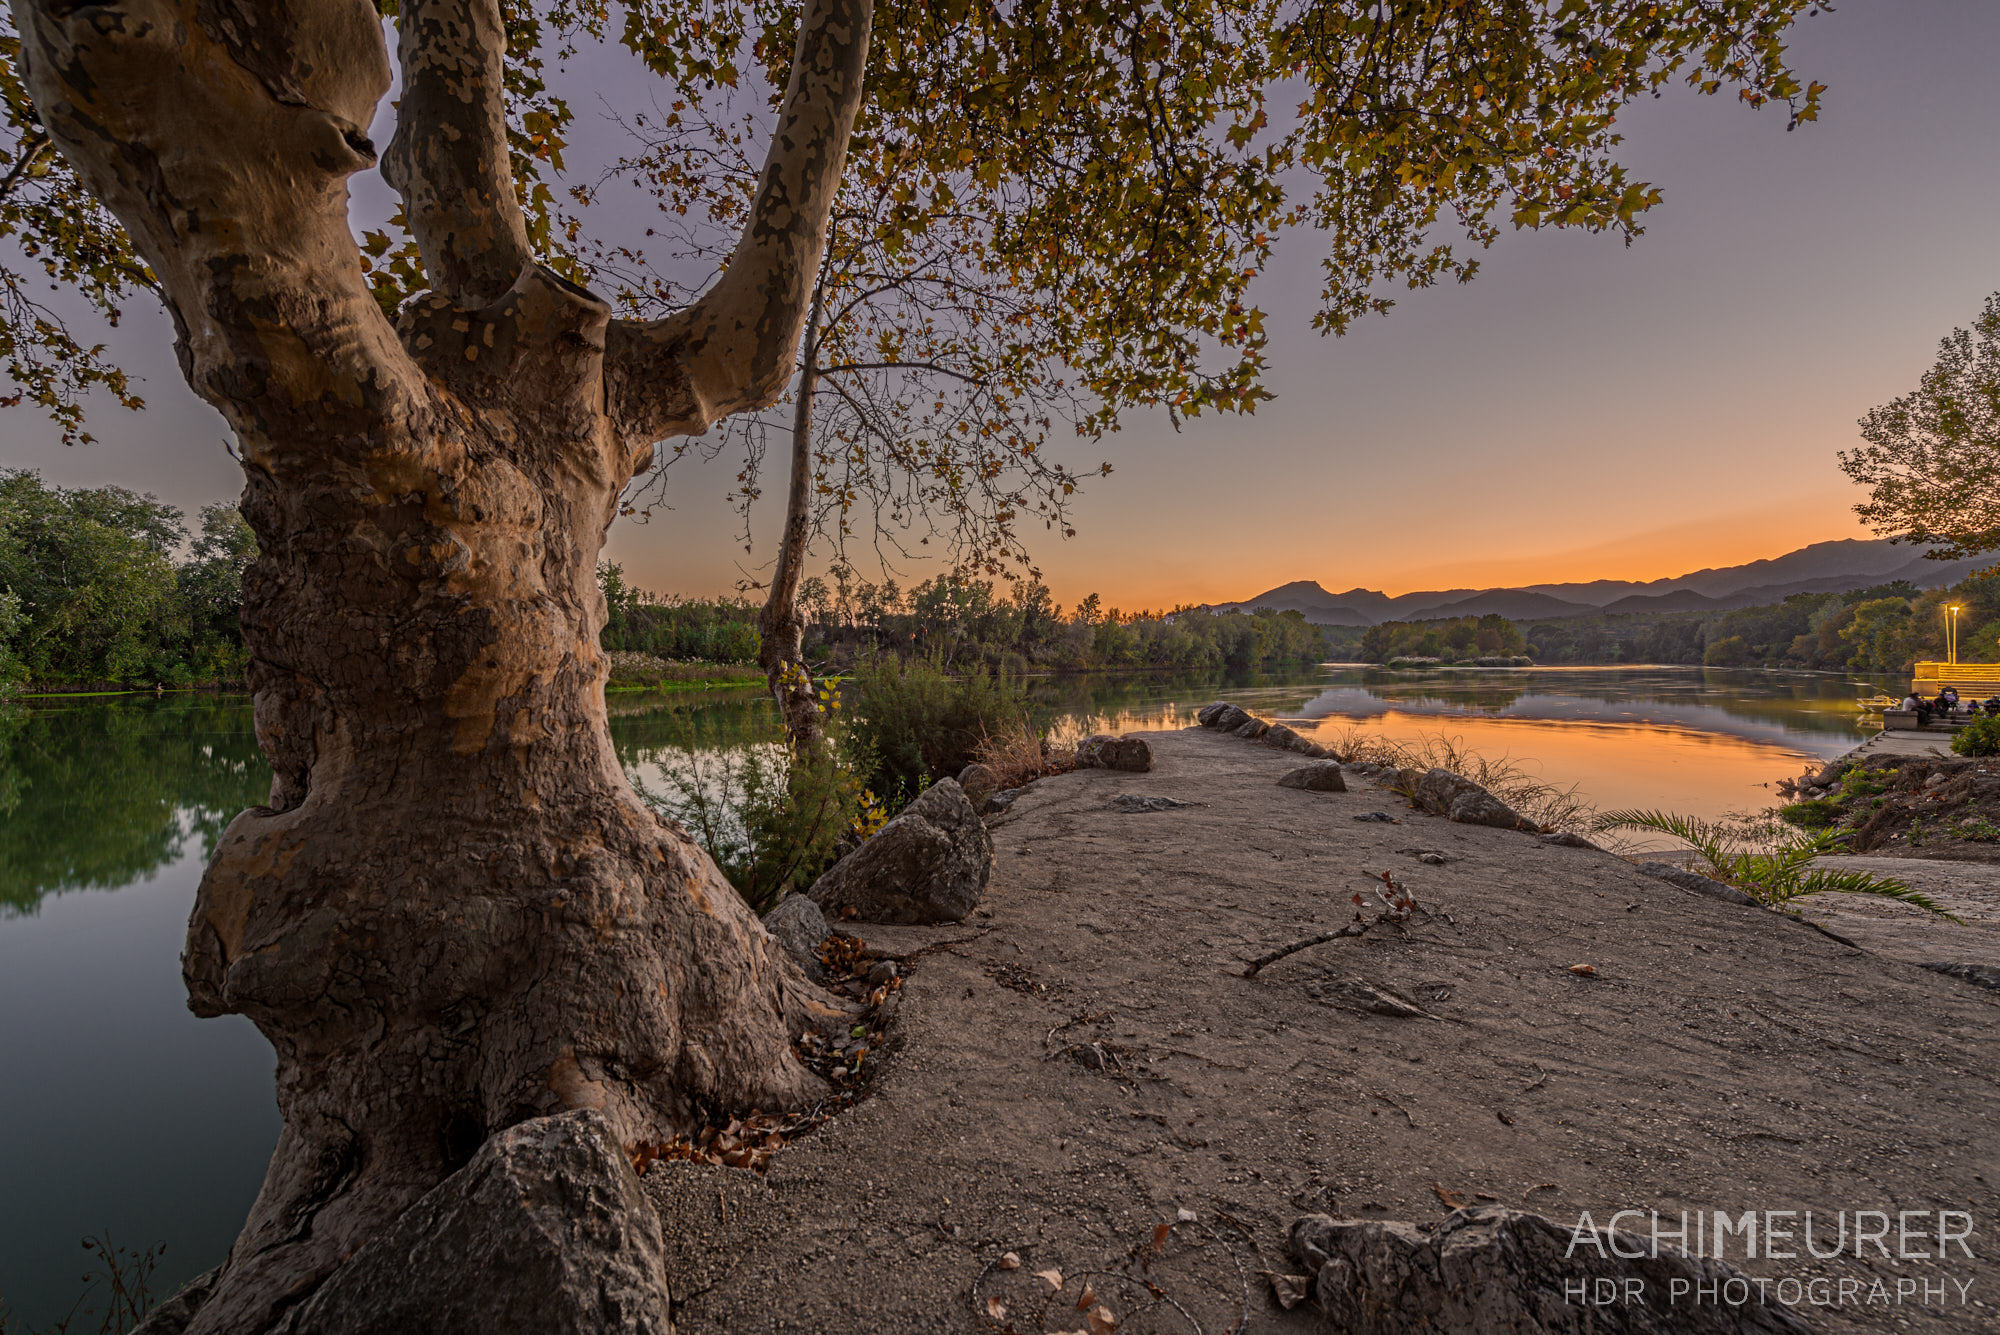 Sonnenuntergang am Flussufer des Ebros in Xerta bei Tortosa, Katalonien, Spanien by Achim Meurer.